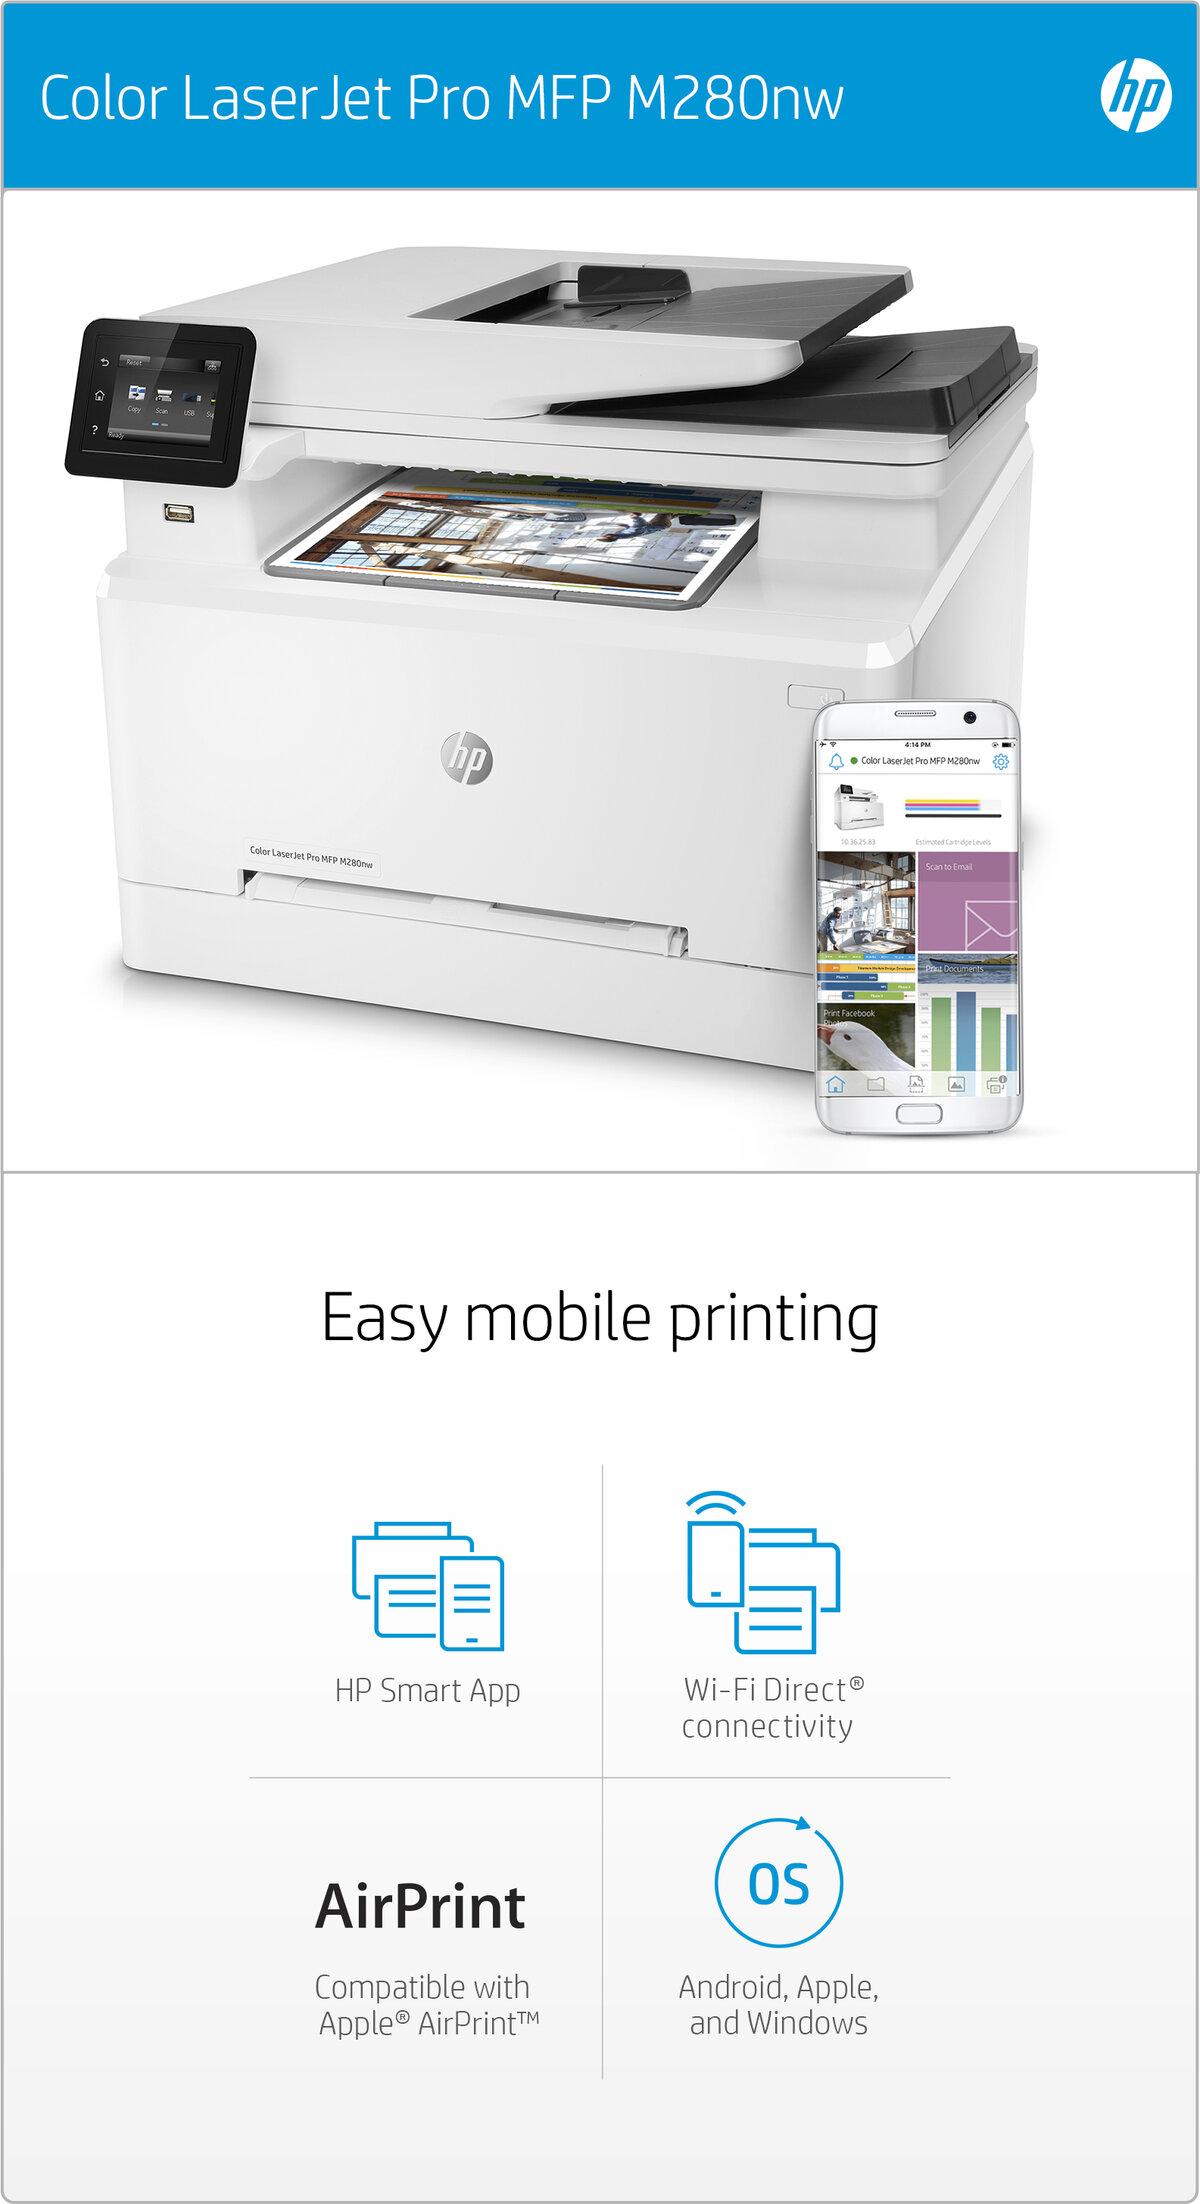 HP Color LaserJet Pro MFP M280nw - multifunction printer